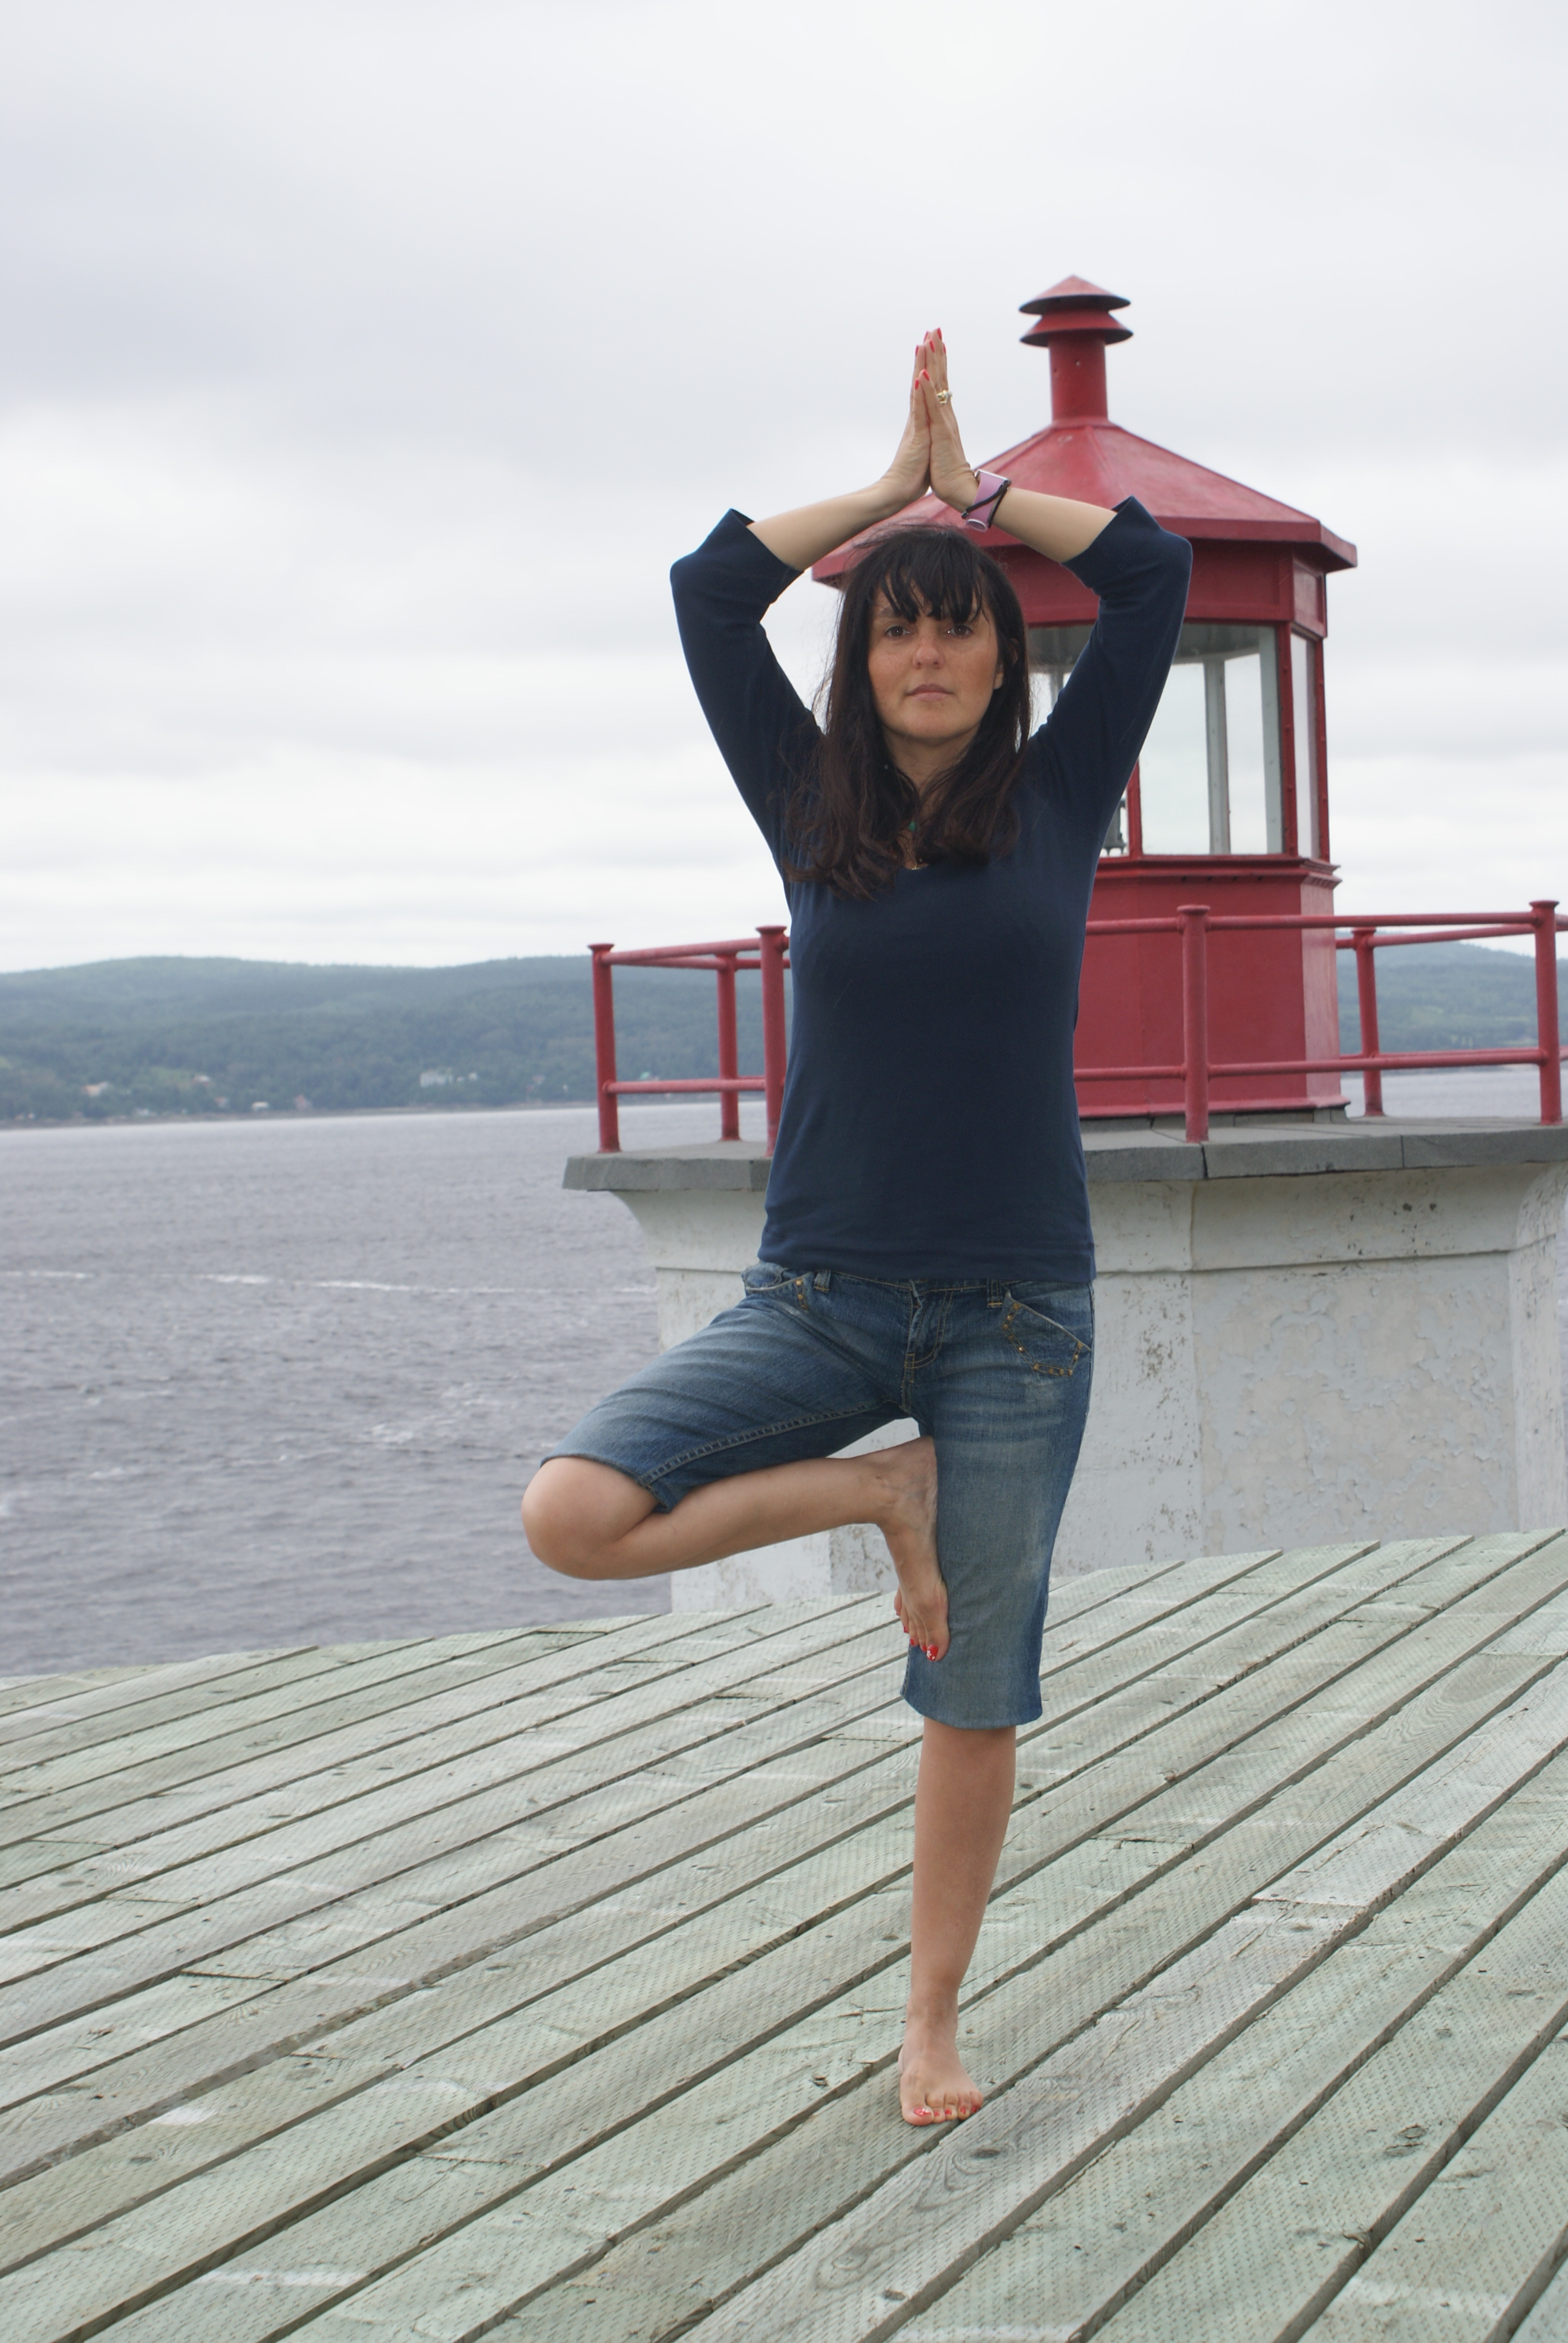 Sony Dsc Yoga Studio Saint Mande